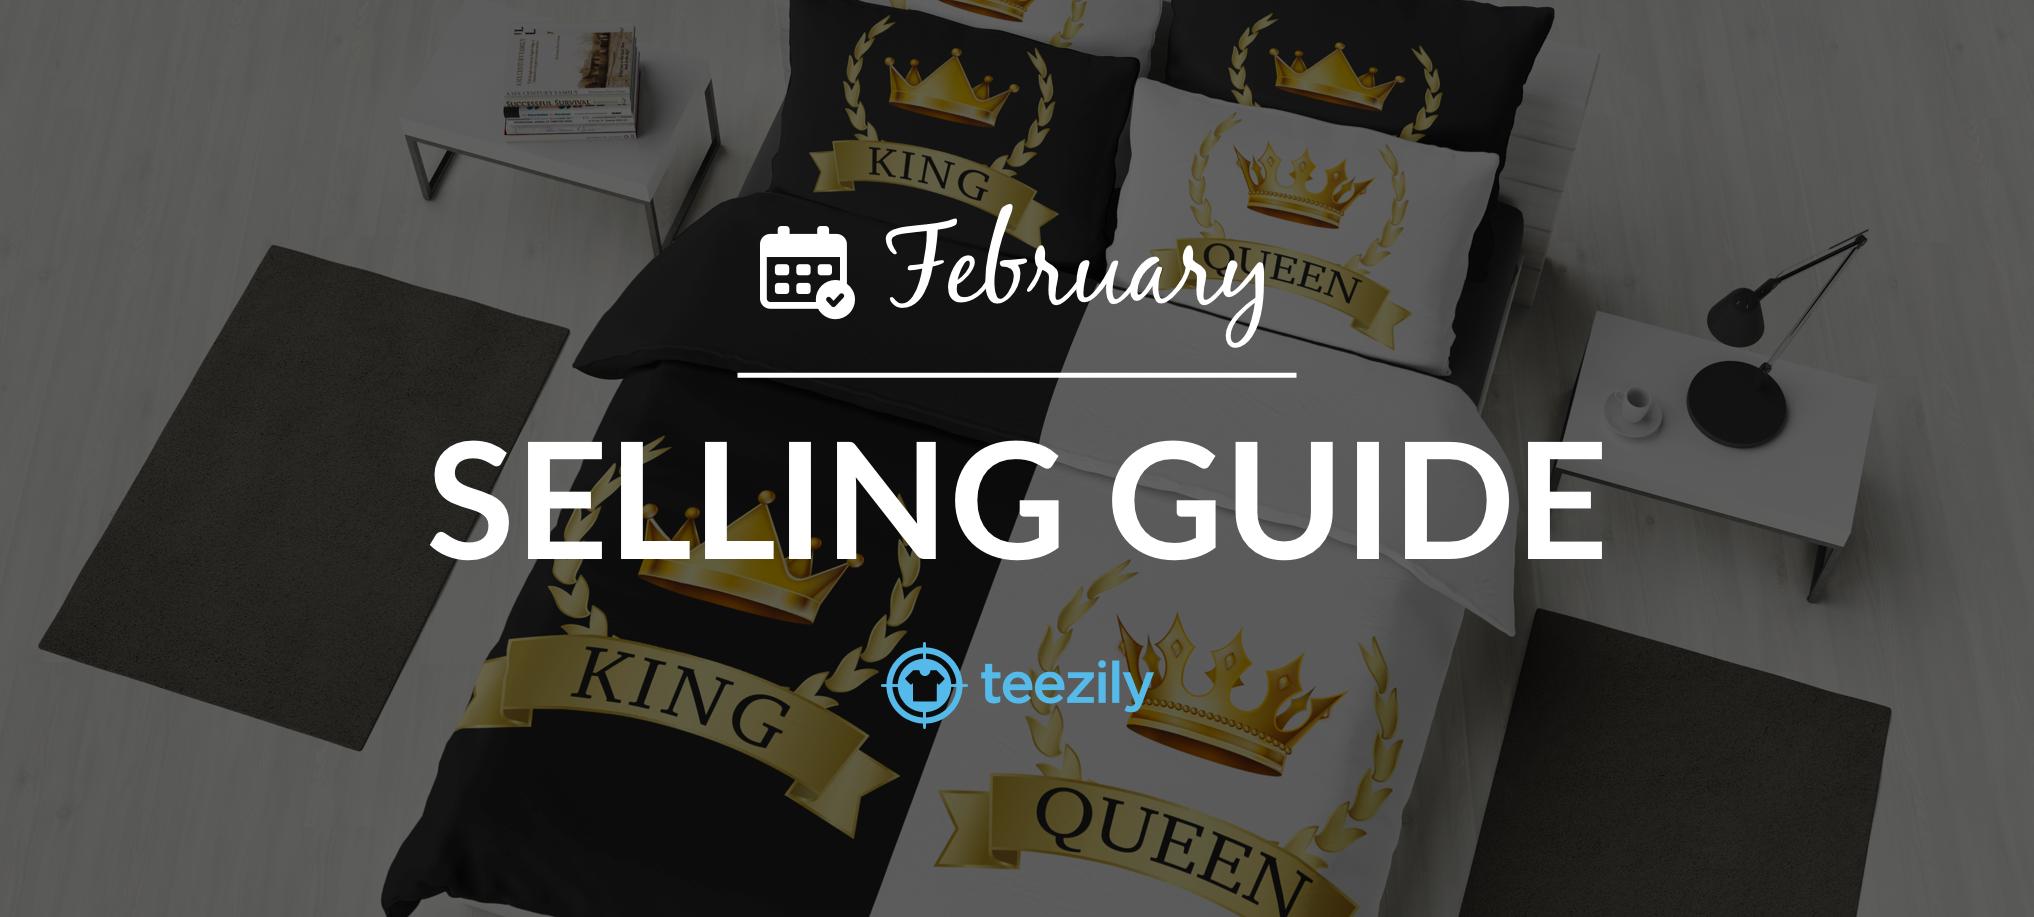 BANNER_February Selling Guide